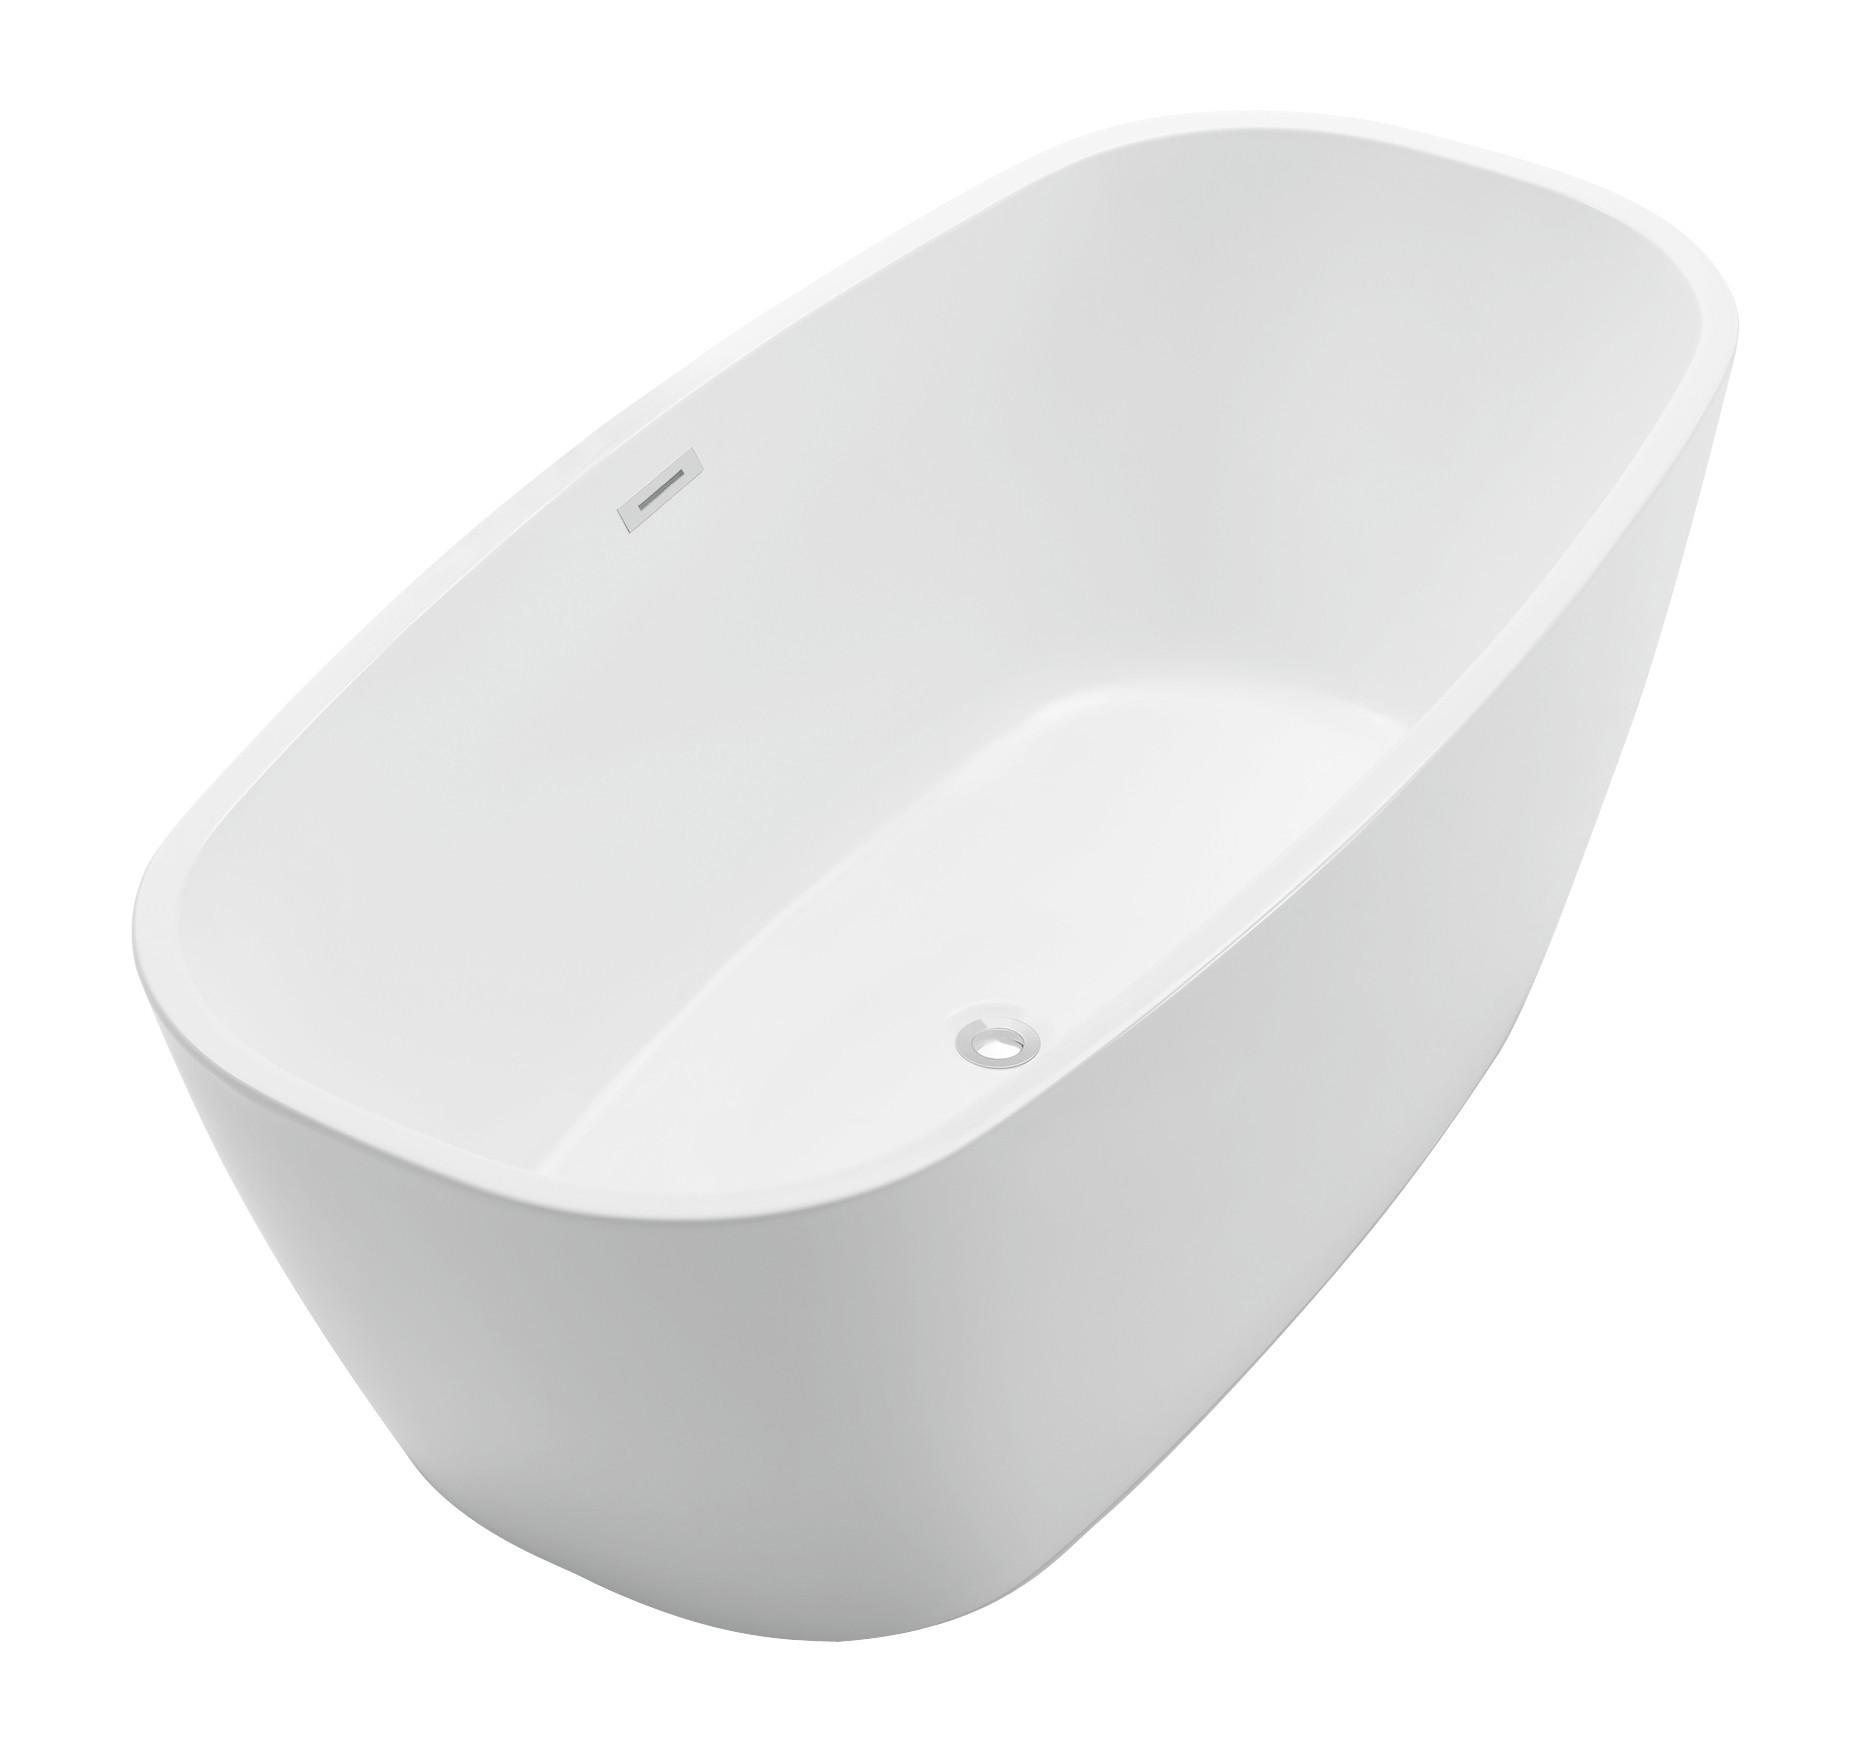 Anzzi FT-AZ108 Bridge Series 5.58 ft. Freestanding Bathtub in White